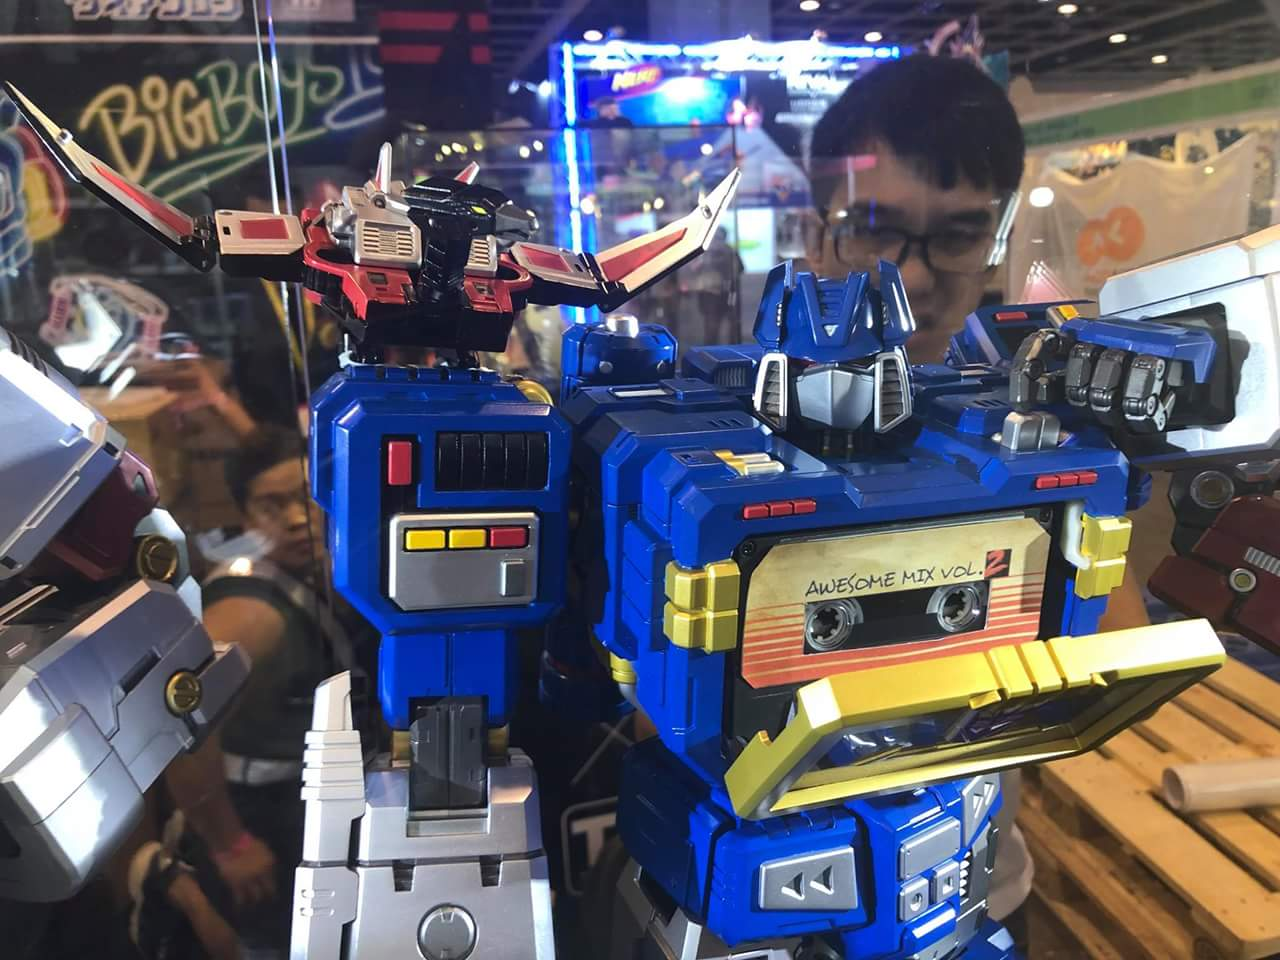 Figurines Transformers G1 (articulé, non transformable) ― Par 3A, Action Toys, Fewture, Toys Alliance, Sentinel, Kotobukiya, Kids Logic, Herocross, EX Gokin, etc - Page 6 40cm4BD6_o